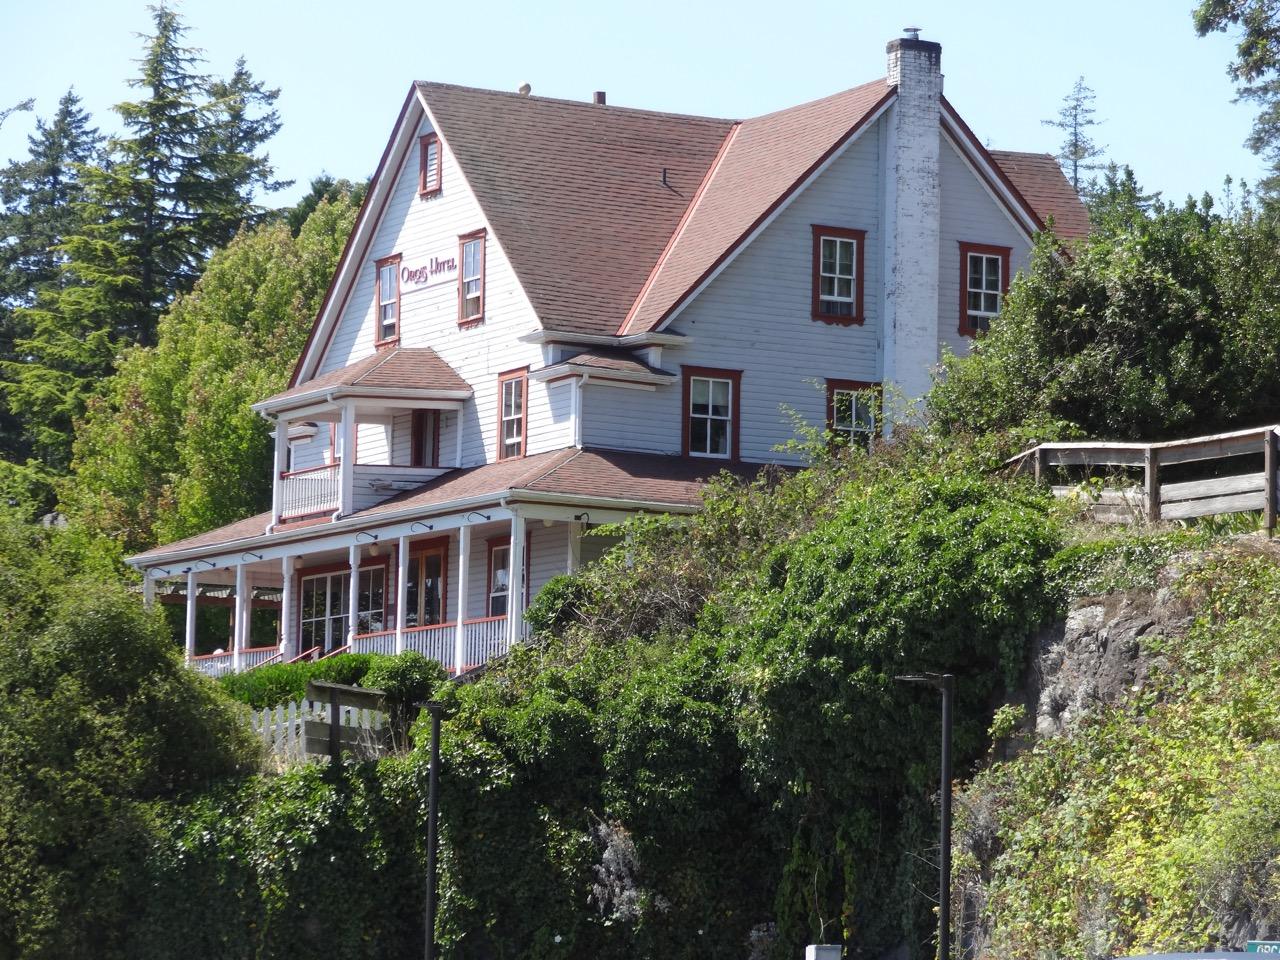 Orcas Hotel